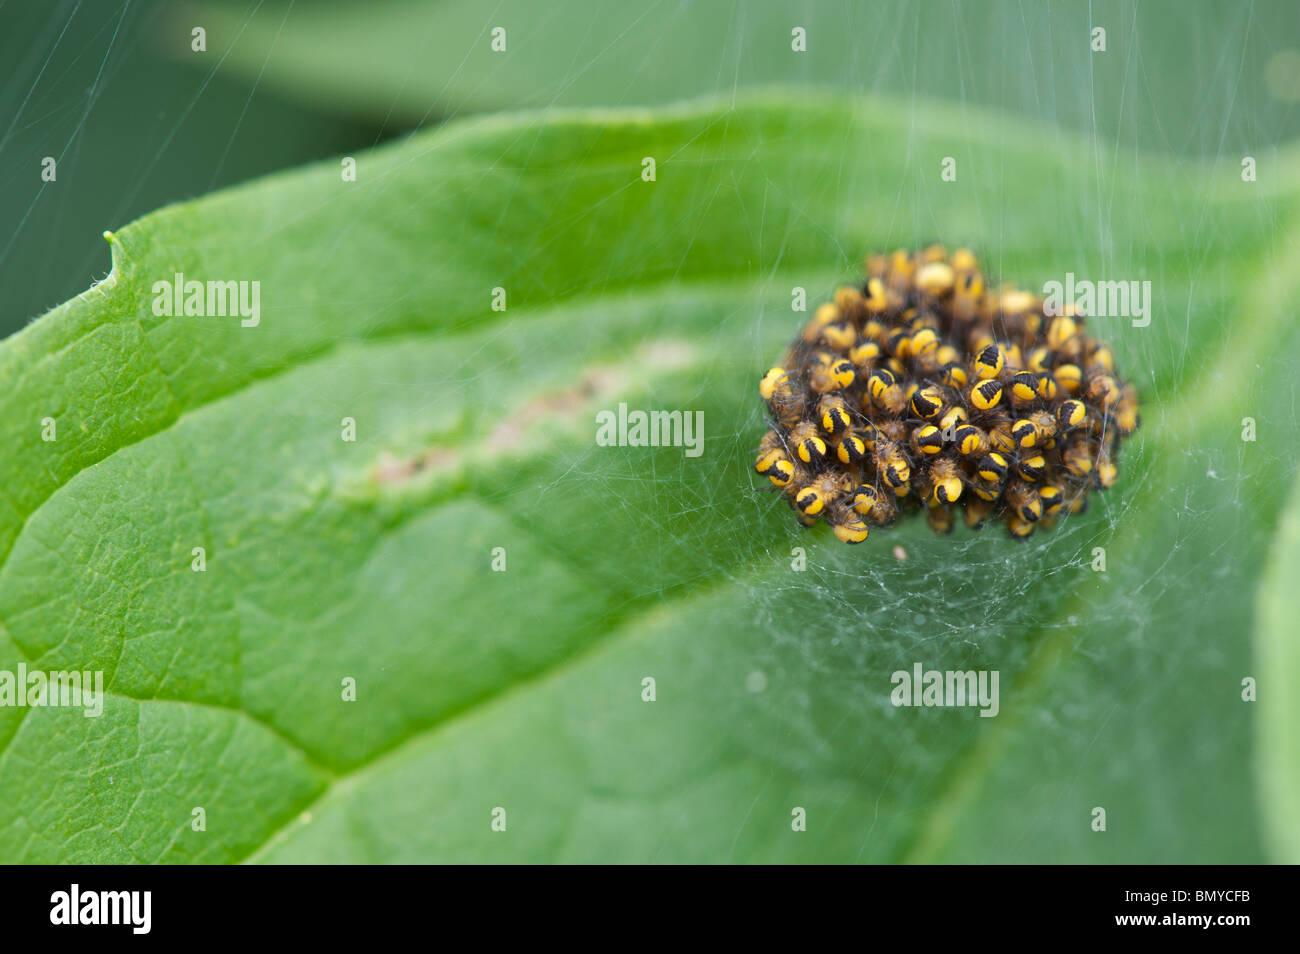 Araneus diadematus. Les jeunes araignées araignées orbweaver dans un nid web Photo Stock